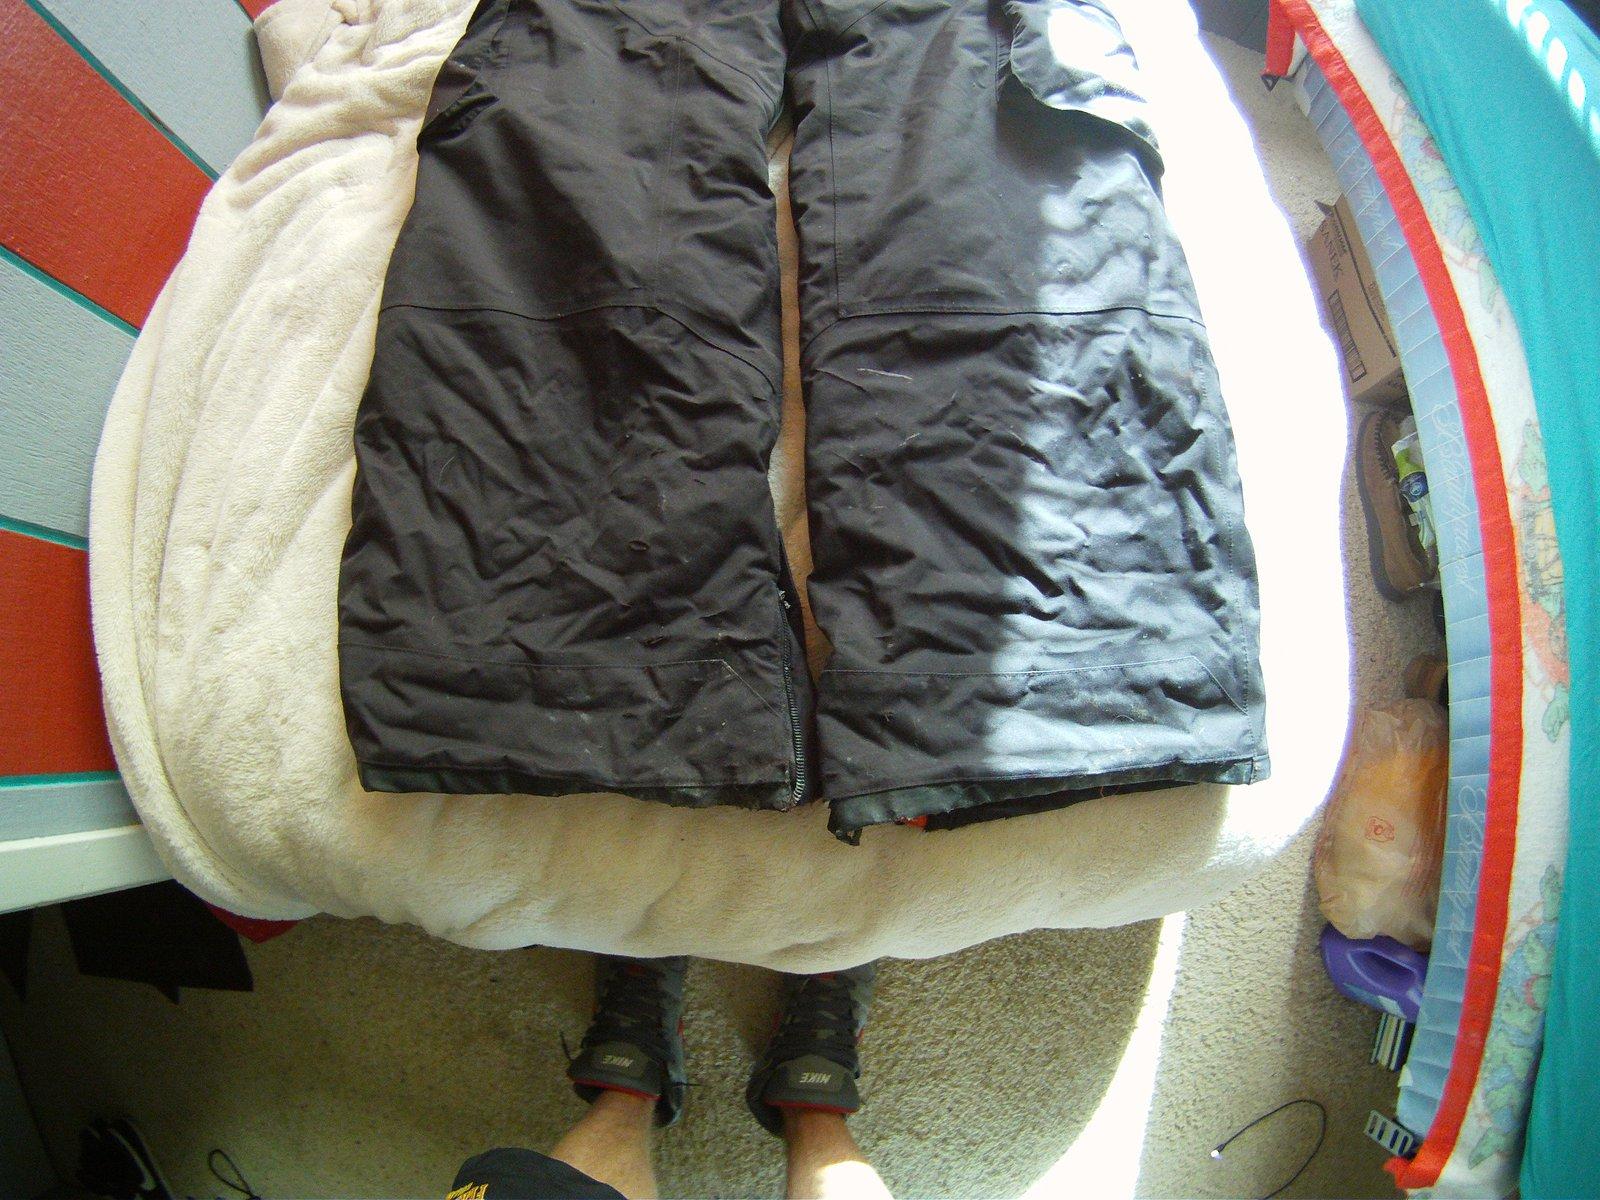 cuffs of black pants